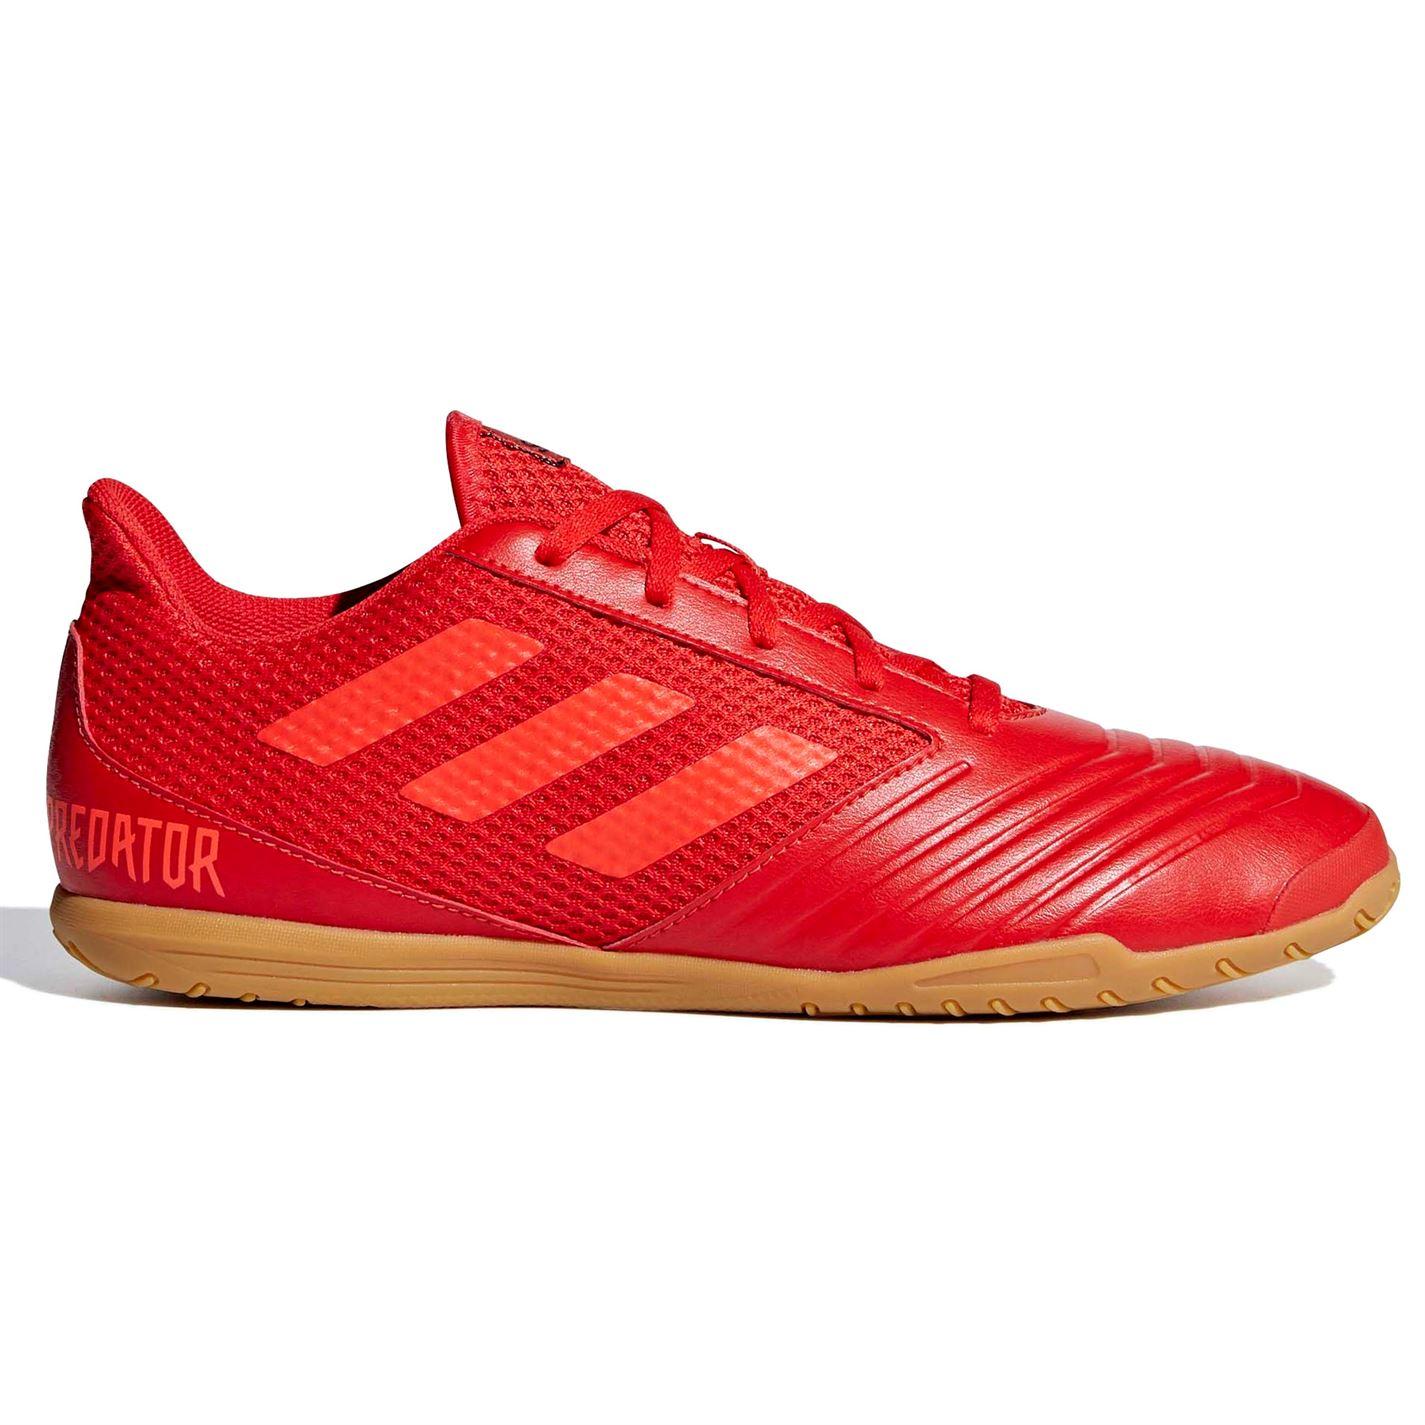 kopačky adidas Predator 19.4 pánské Indoor